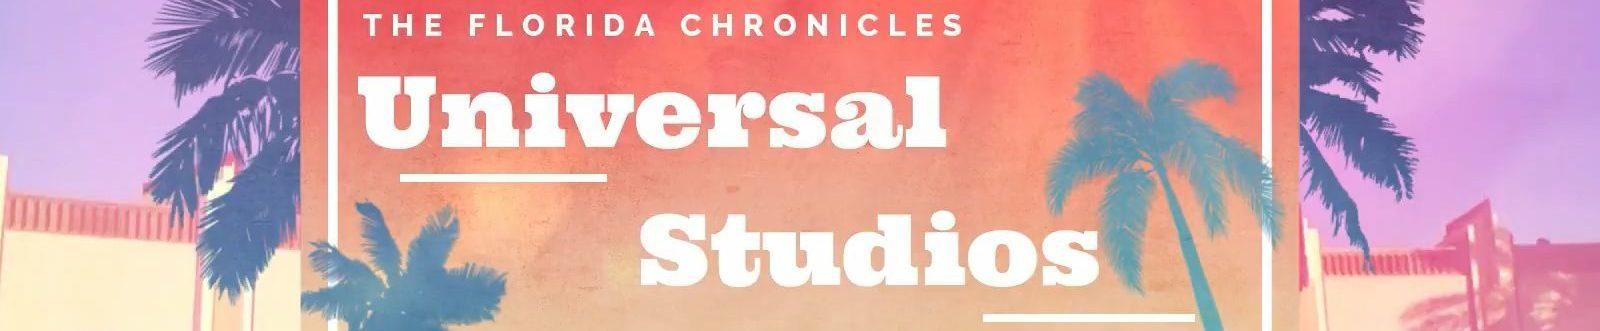 Project Orange – The Florida Chronicles – Episode 1